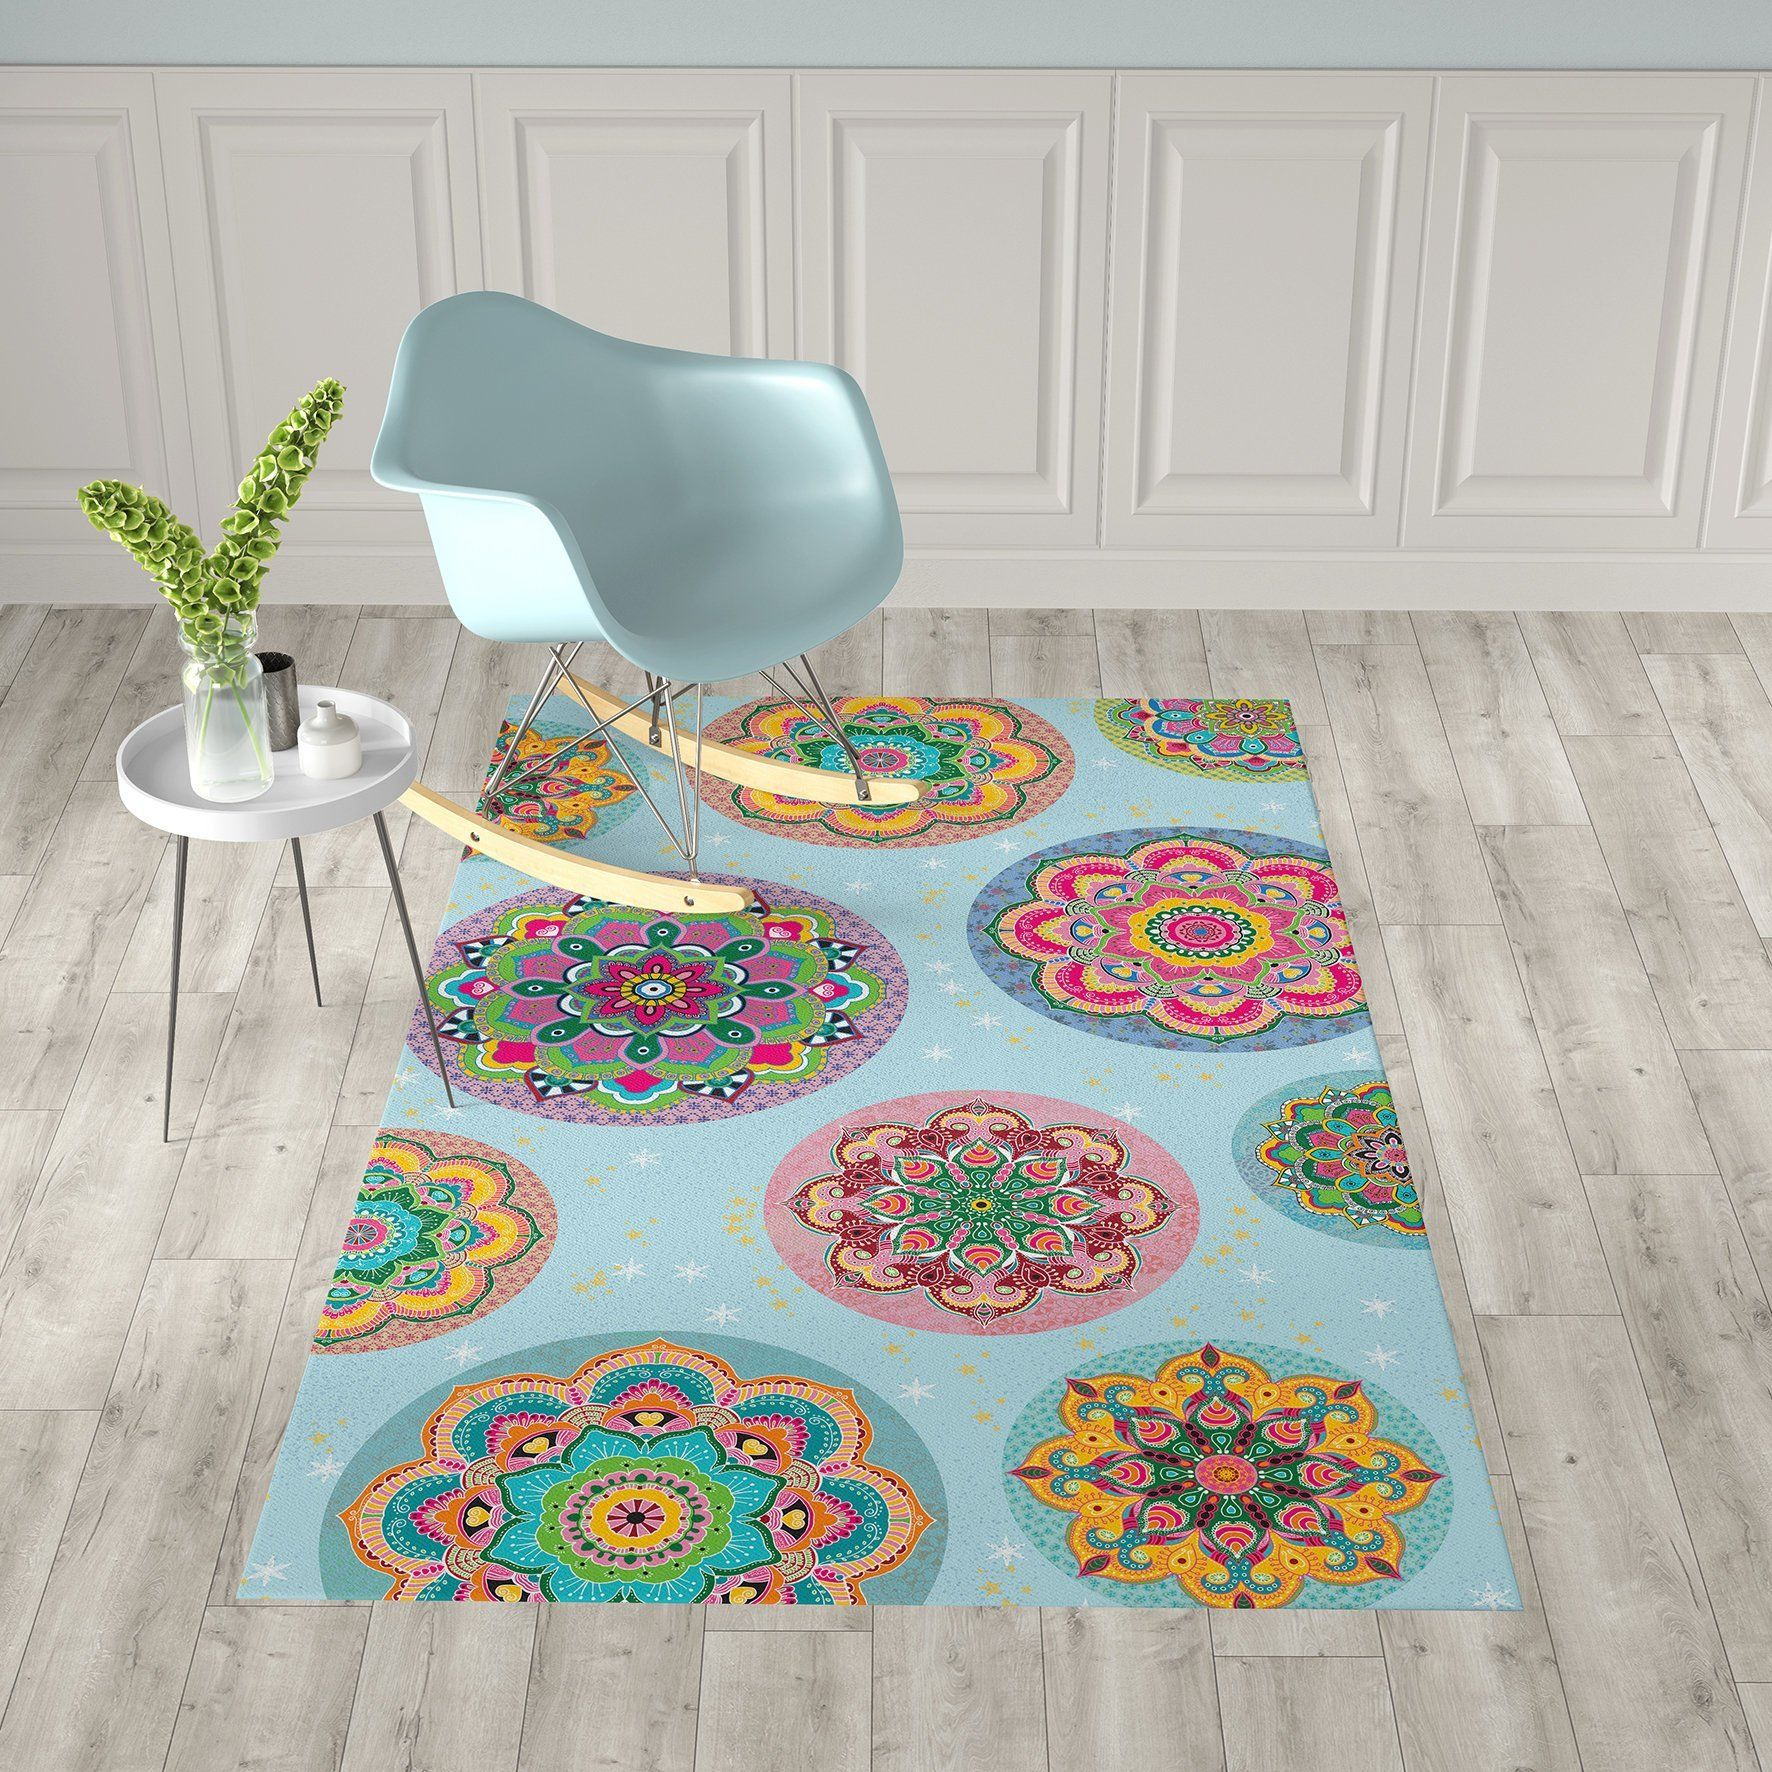 Large Mandala Vinyl Area Mat Beautiful Home Office Rug Non Etsy Kitchen Mats Floor Chair Mats Vinyl Floor Mat